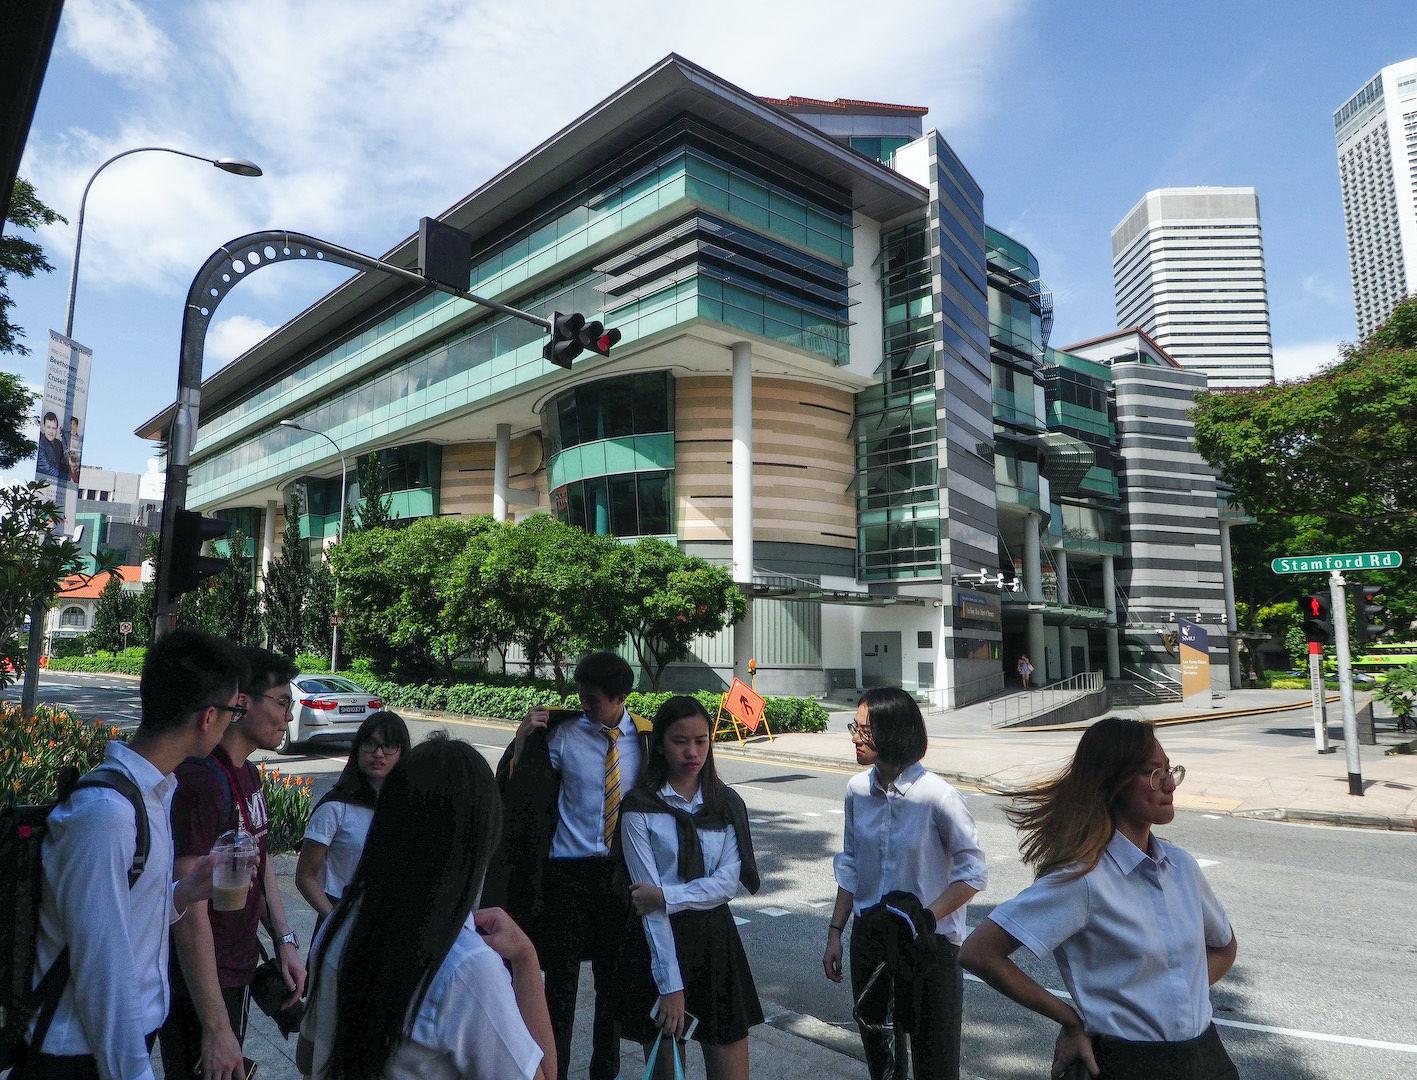 Travel restrictions - EDGEPROP SINGAPORE